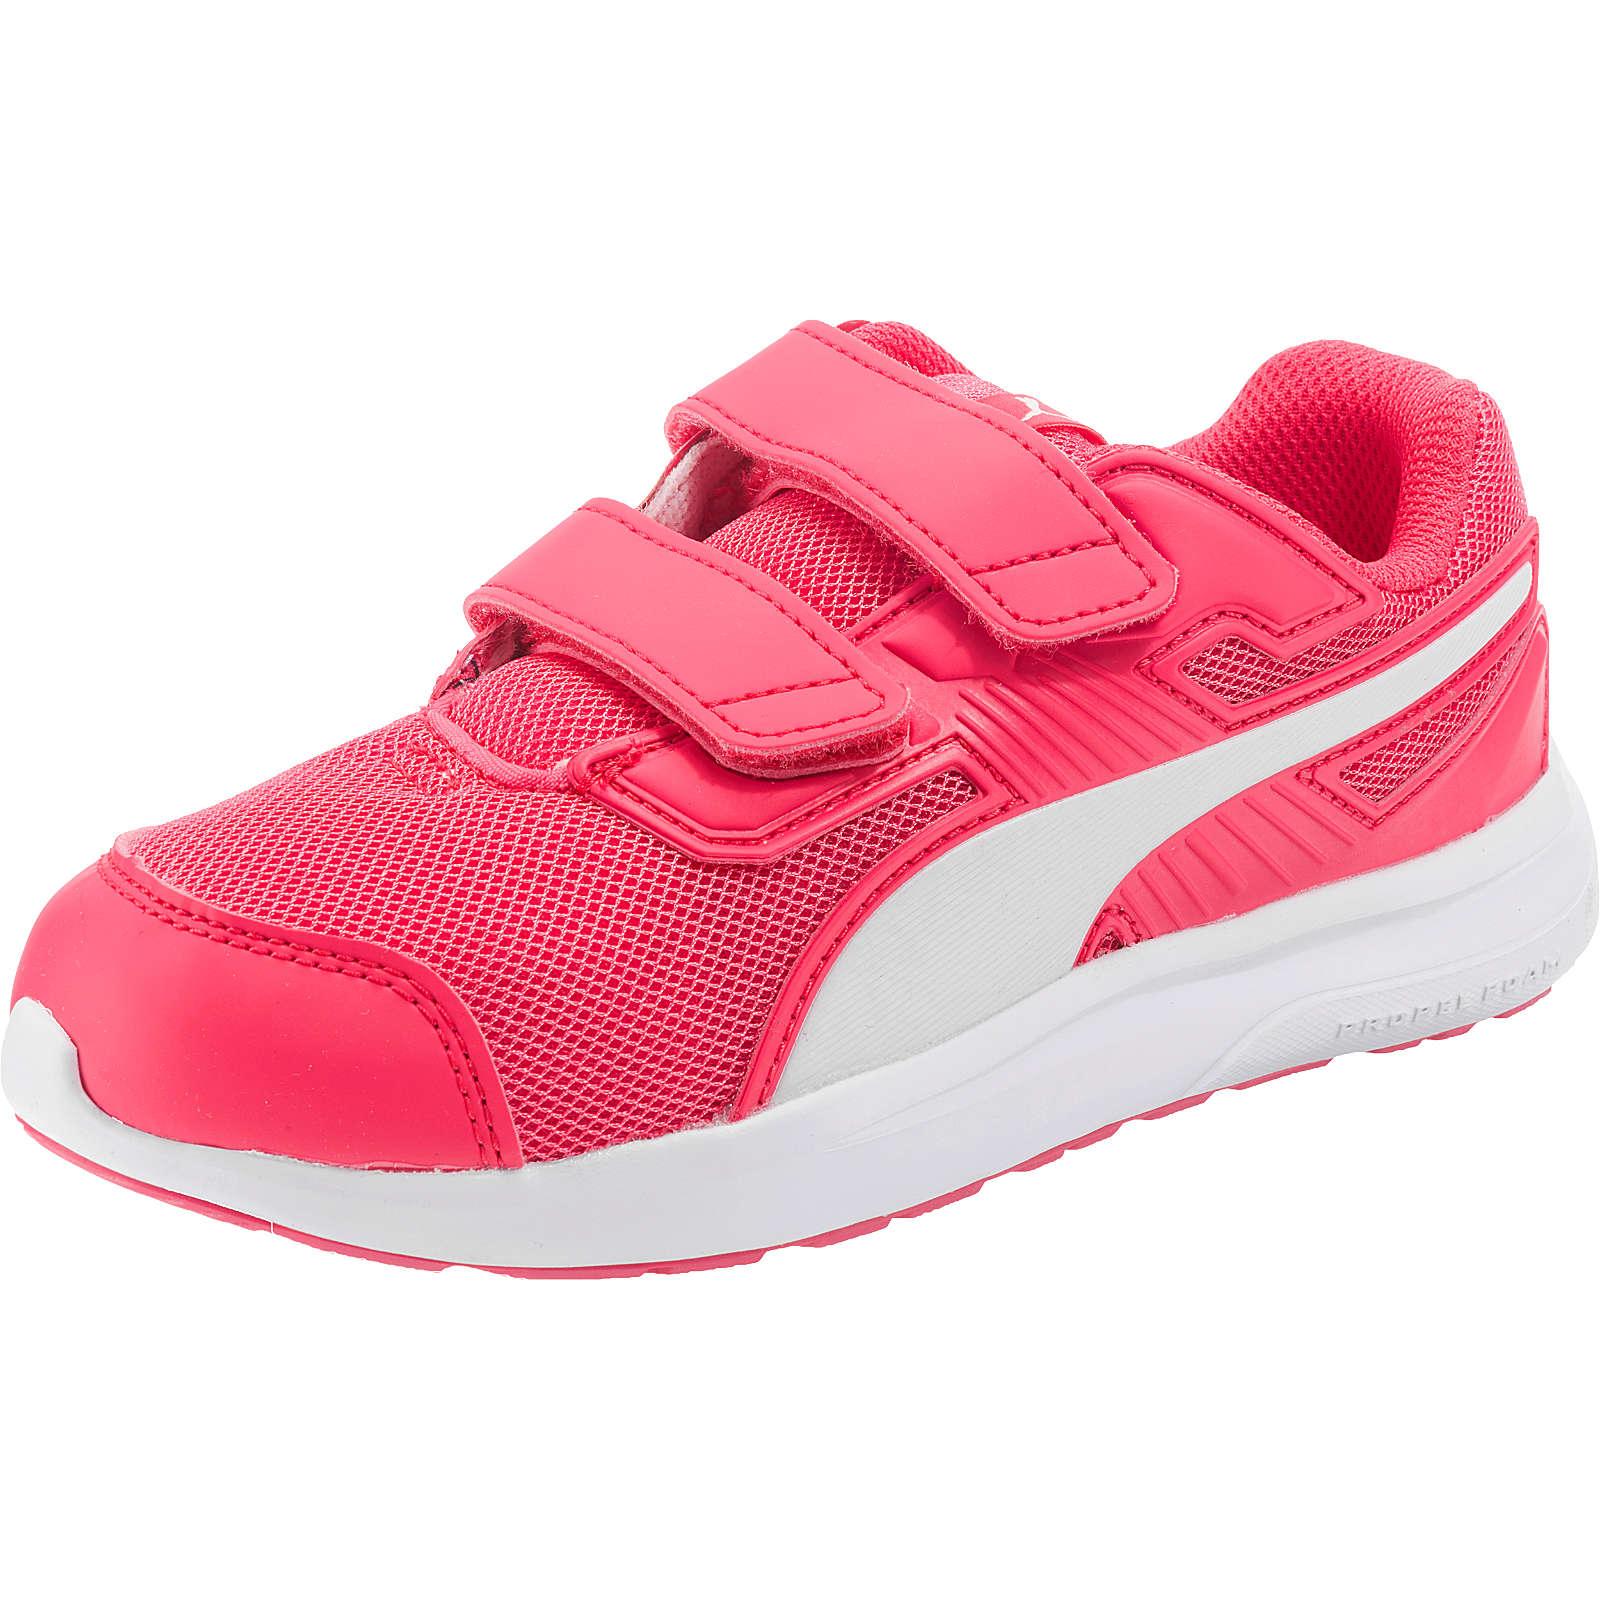 PUMA Kinder Sportschuhe Escaper pink Mädchen Gr. 30